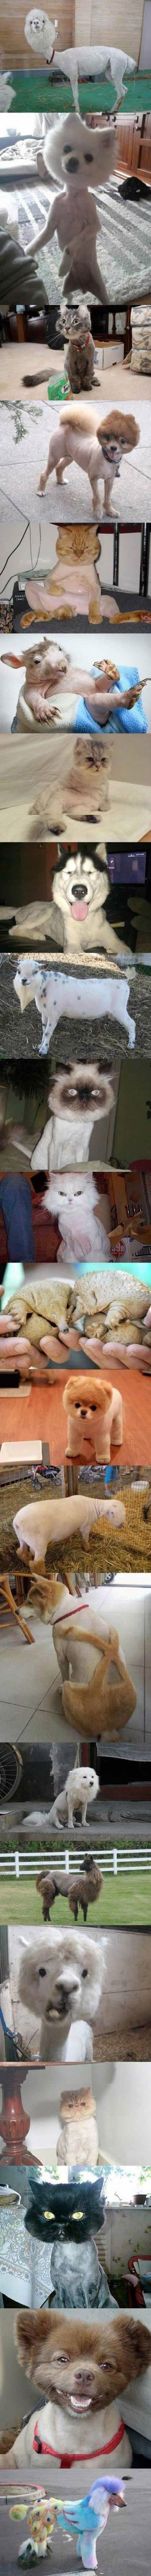 Adorable Half-Shaved Animals